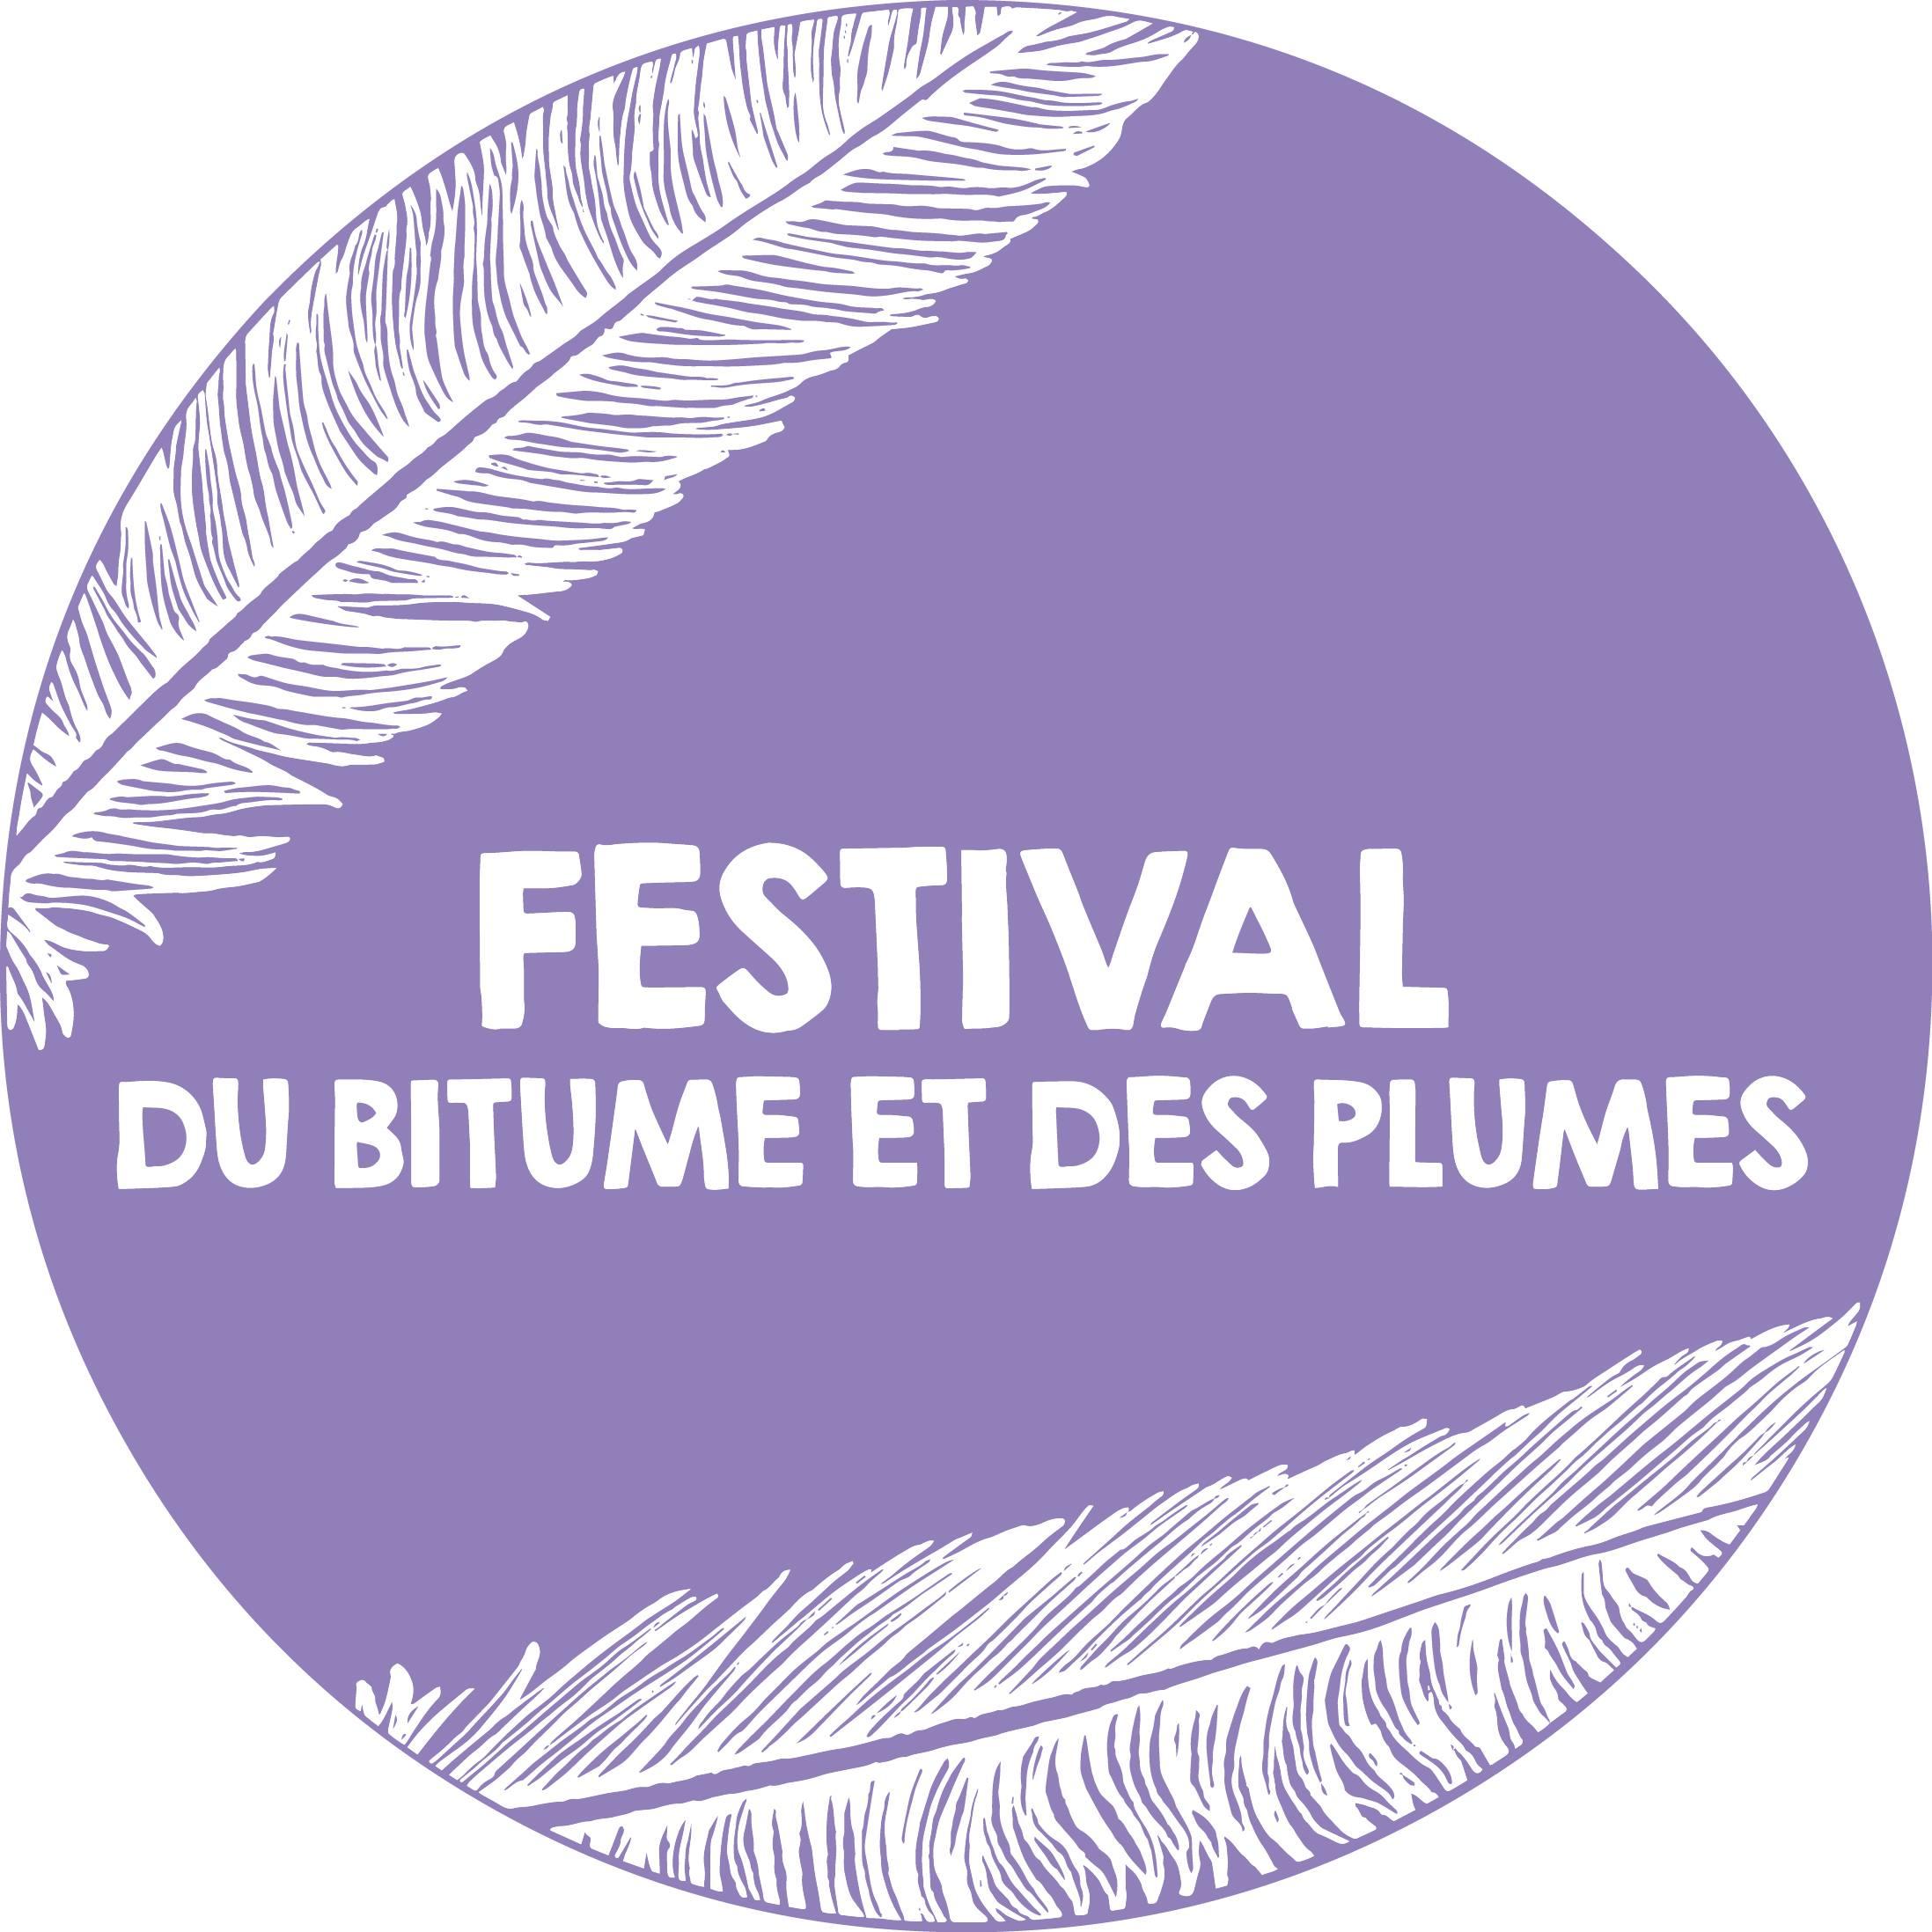 logo-festival-bitume-plumes-2020